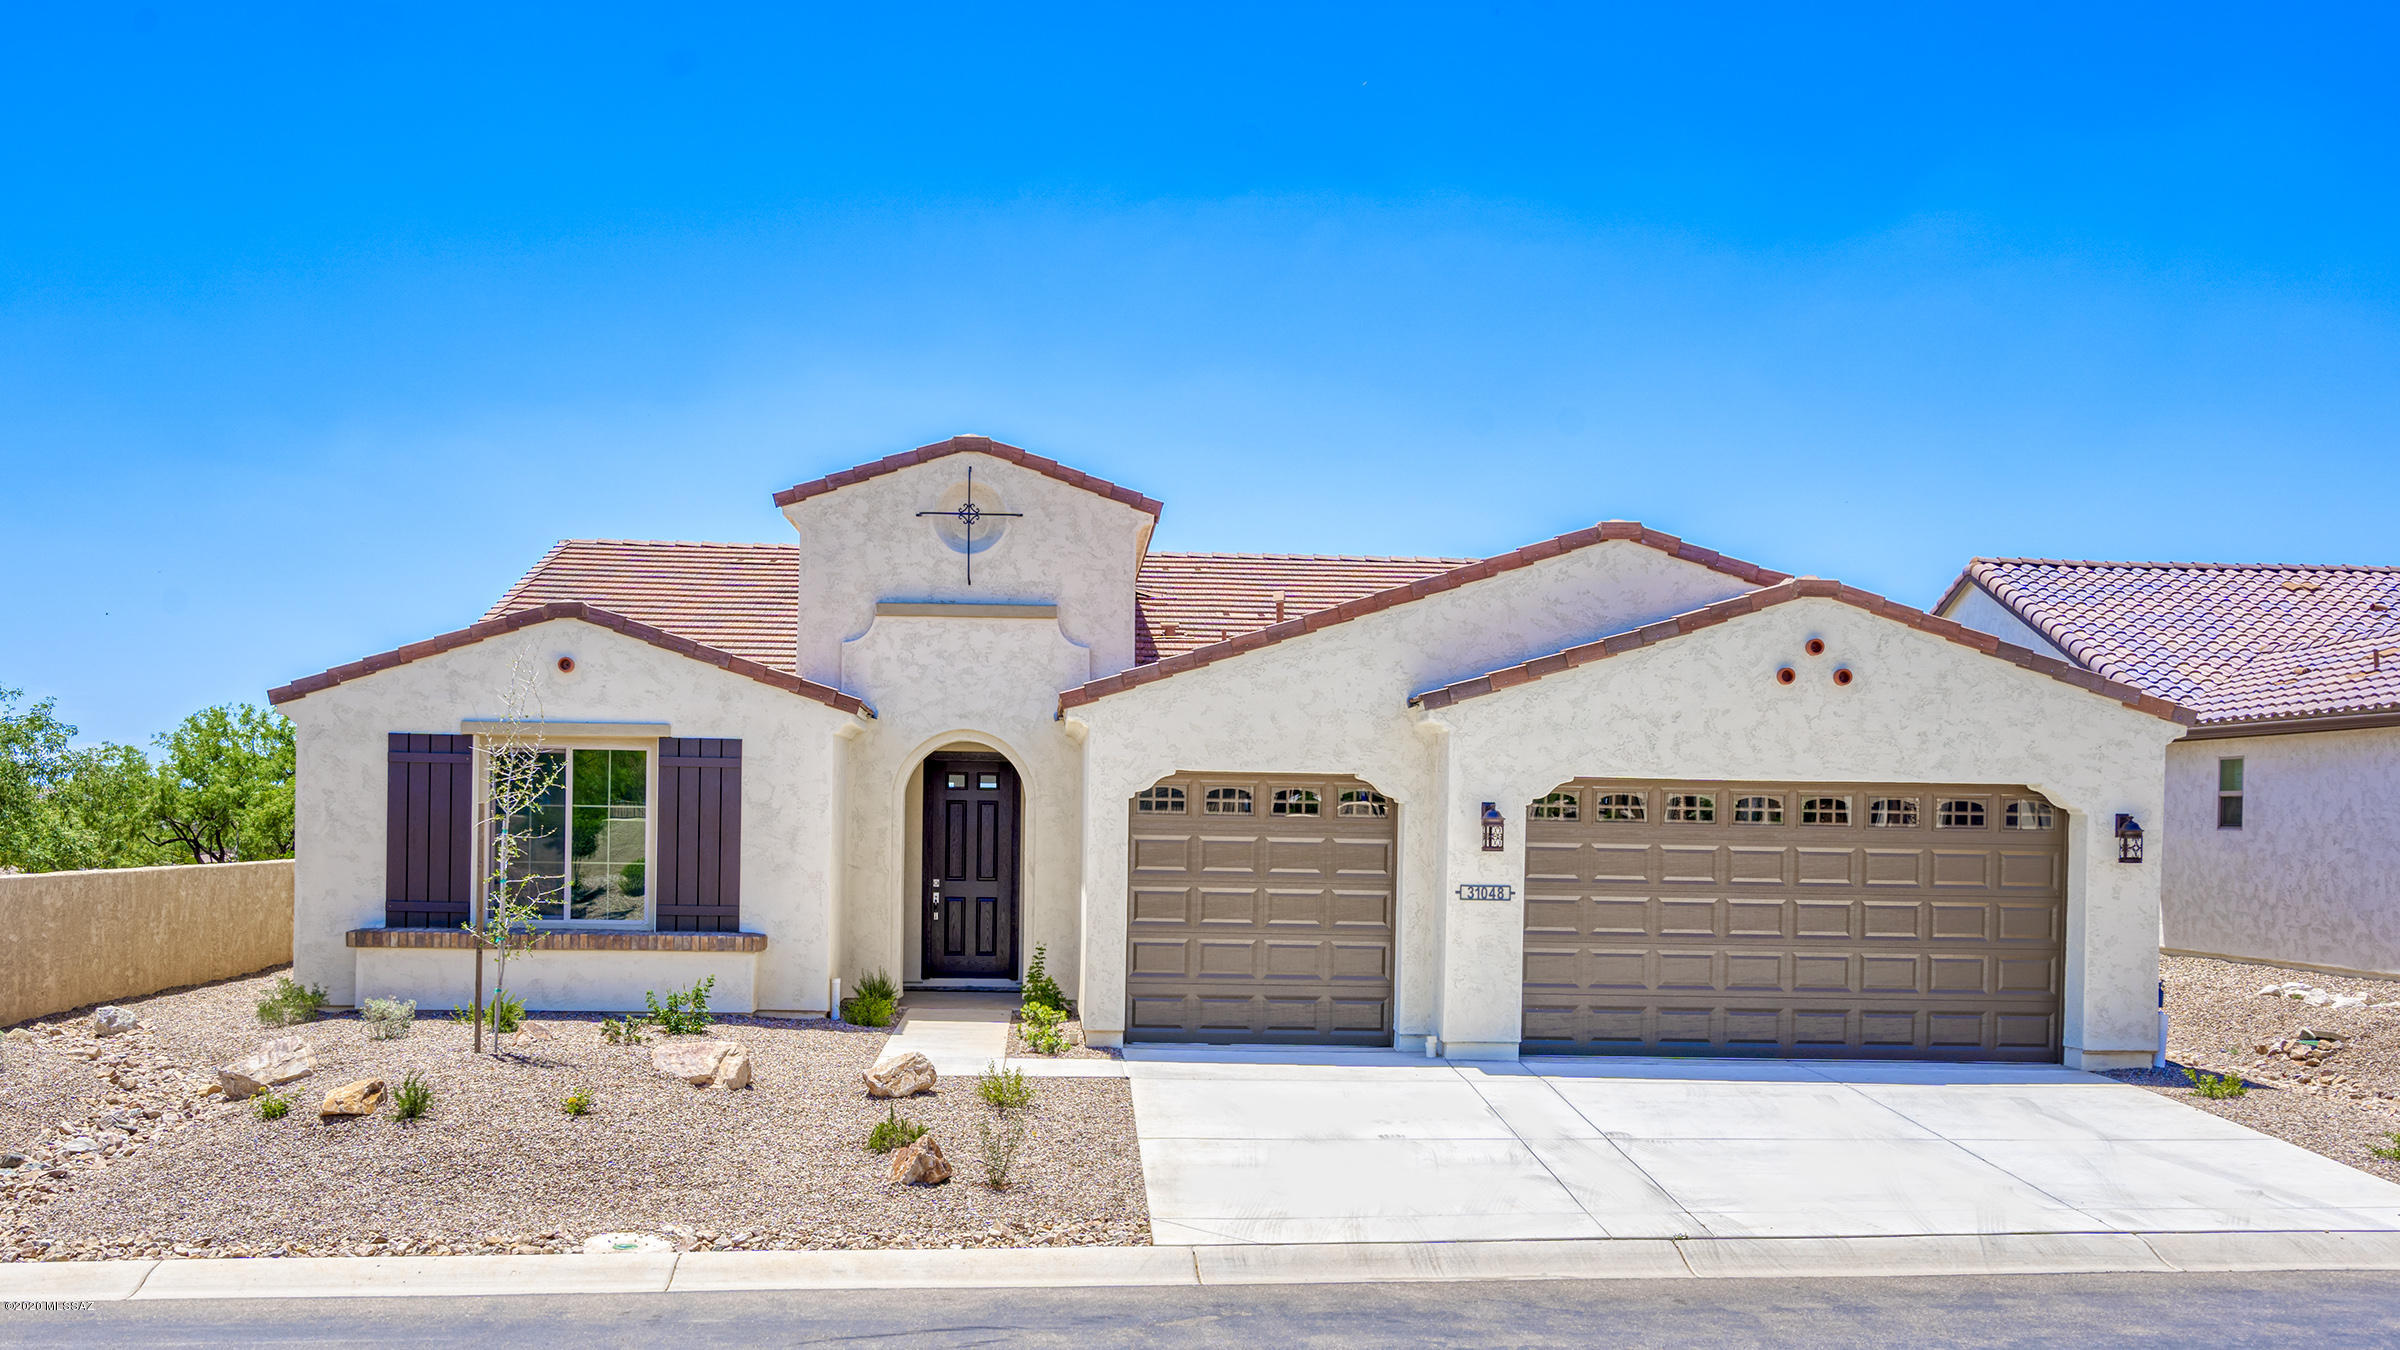 Photo of 31048 S Canyon Vista Way, Oracle, AZ 85623